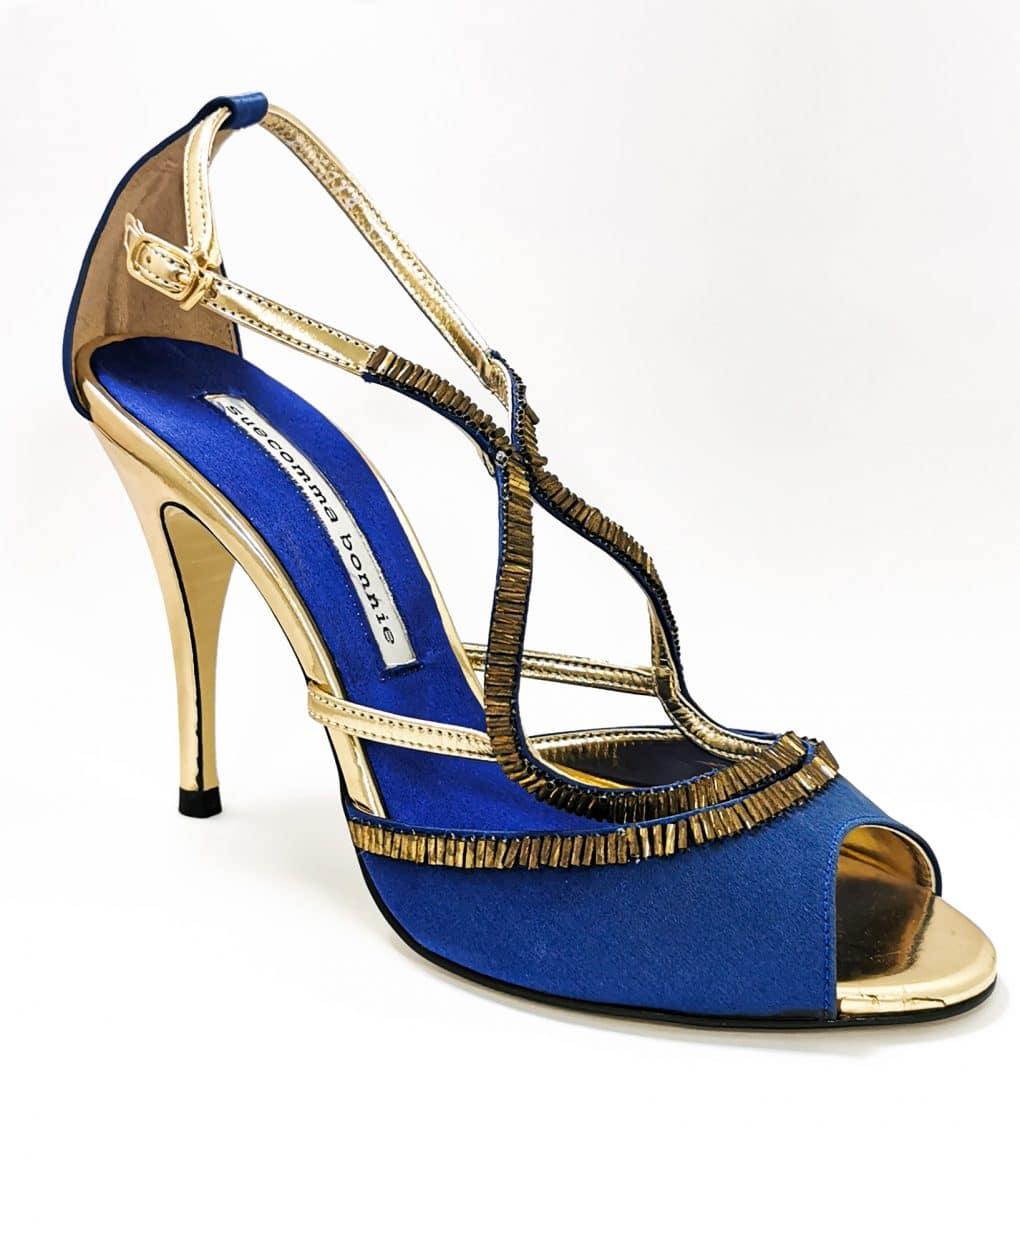 Blue-and-Gold-strappy-heels-SueComma-Bonnie-Alila